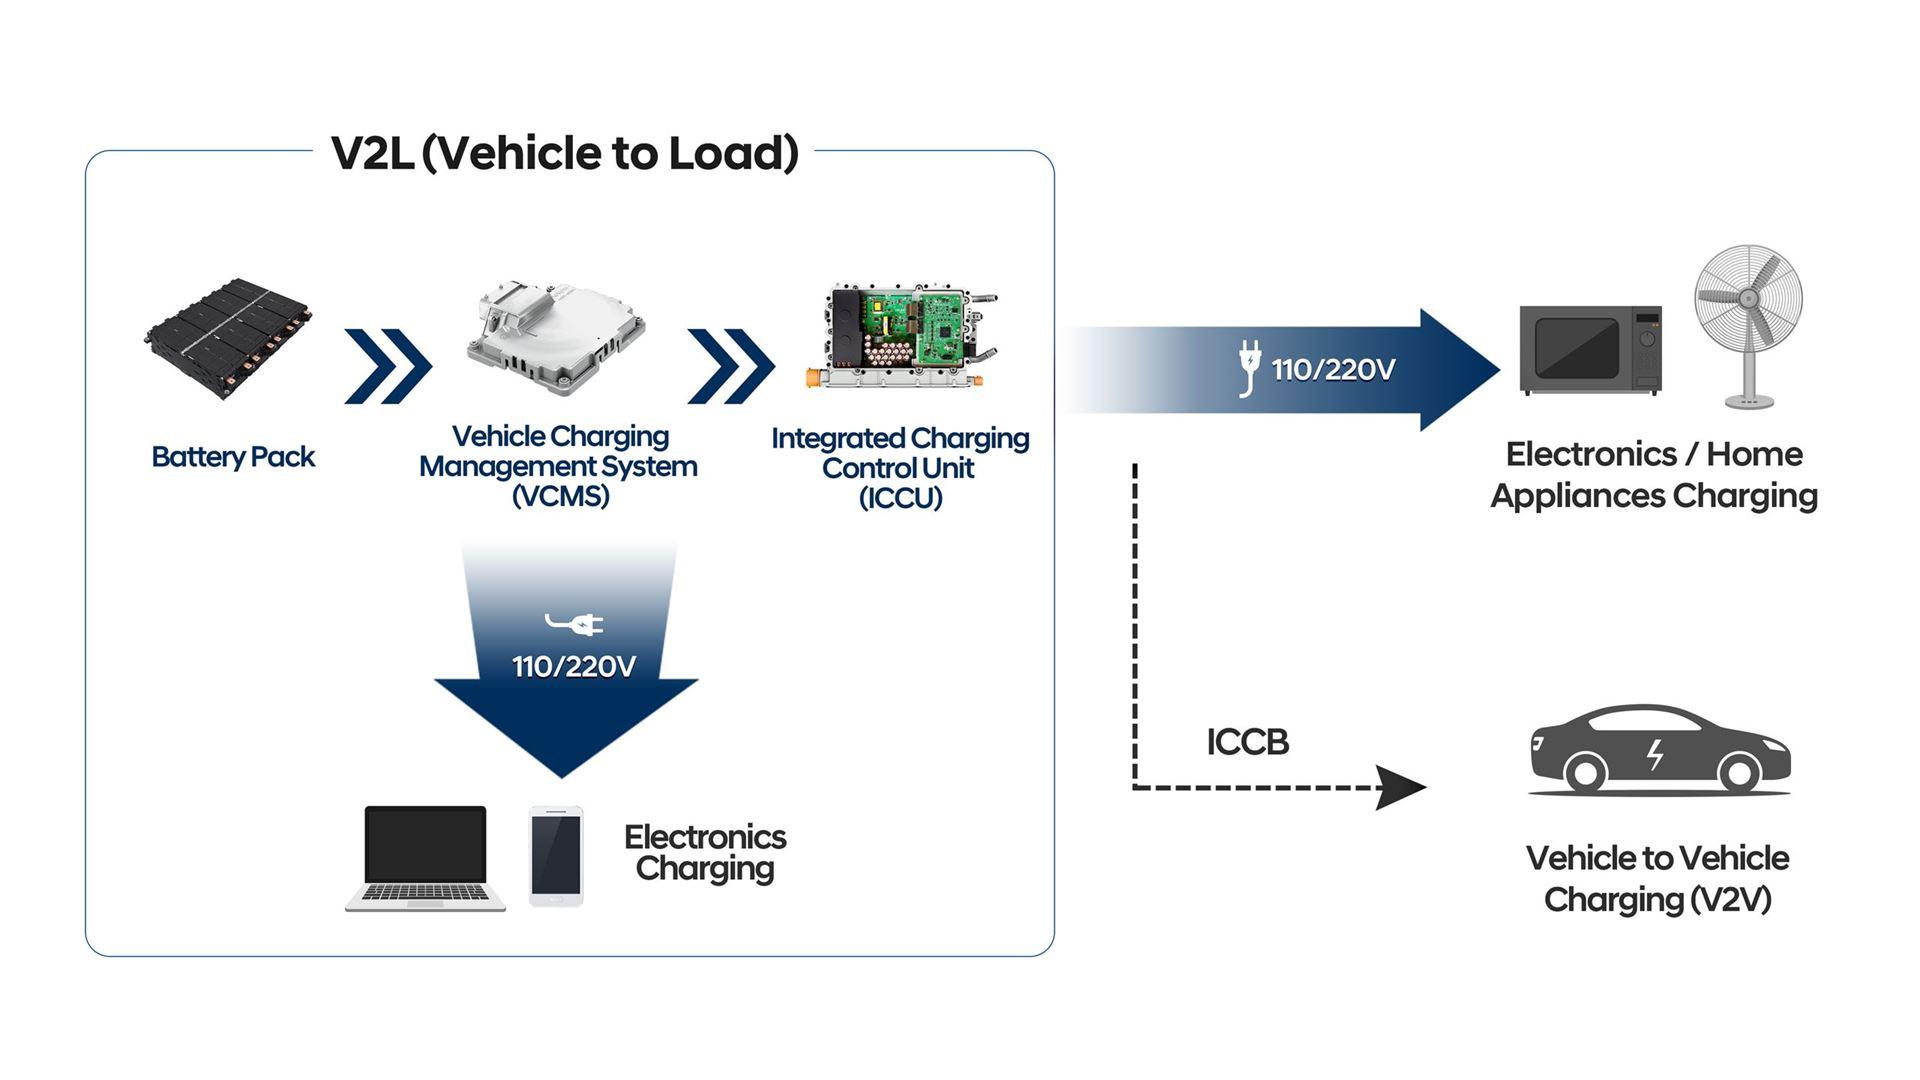 Hyundai Motor Group to Lead Charge into Electric Era with Dedicated EV Platform 'E-GMP' - Image 4